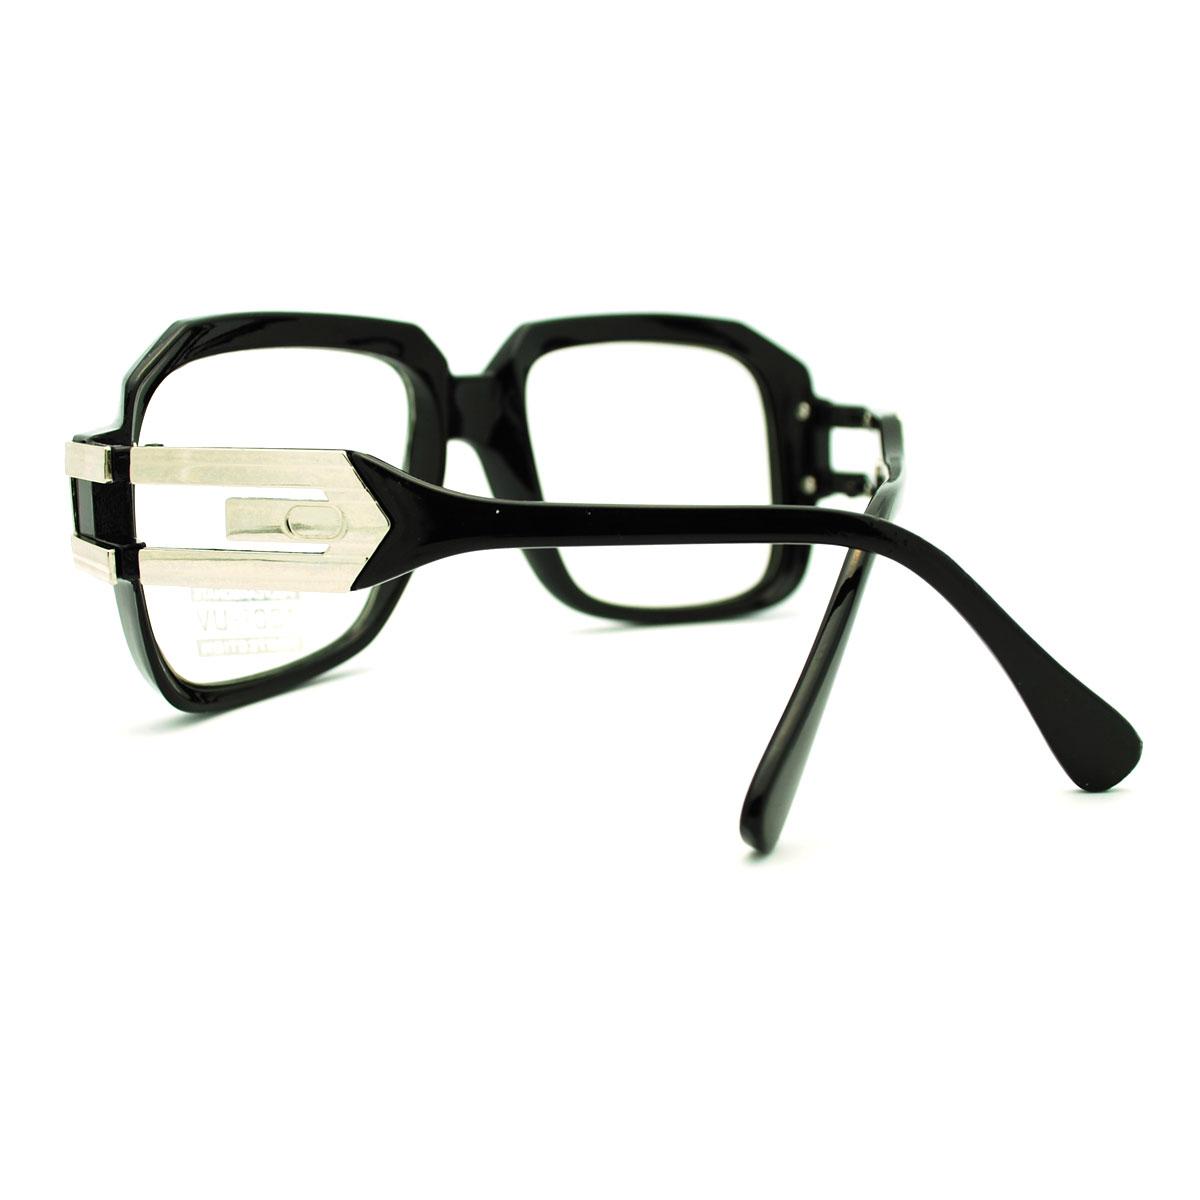 34b4754ead67 Gazelle Glasses Frames